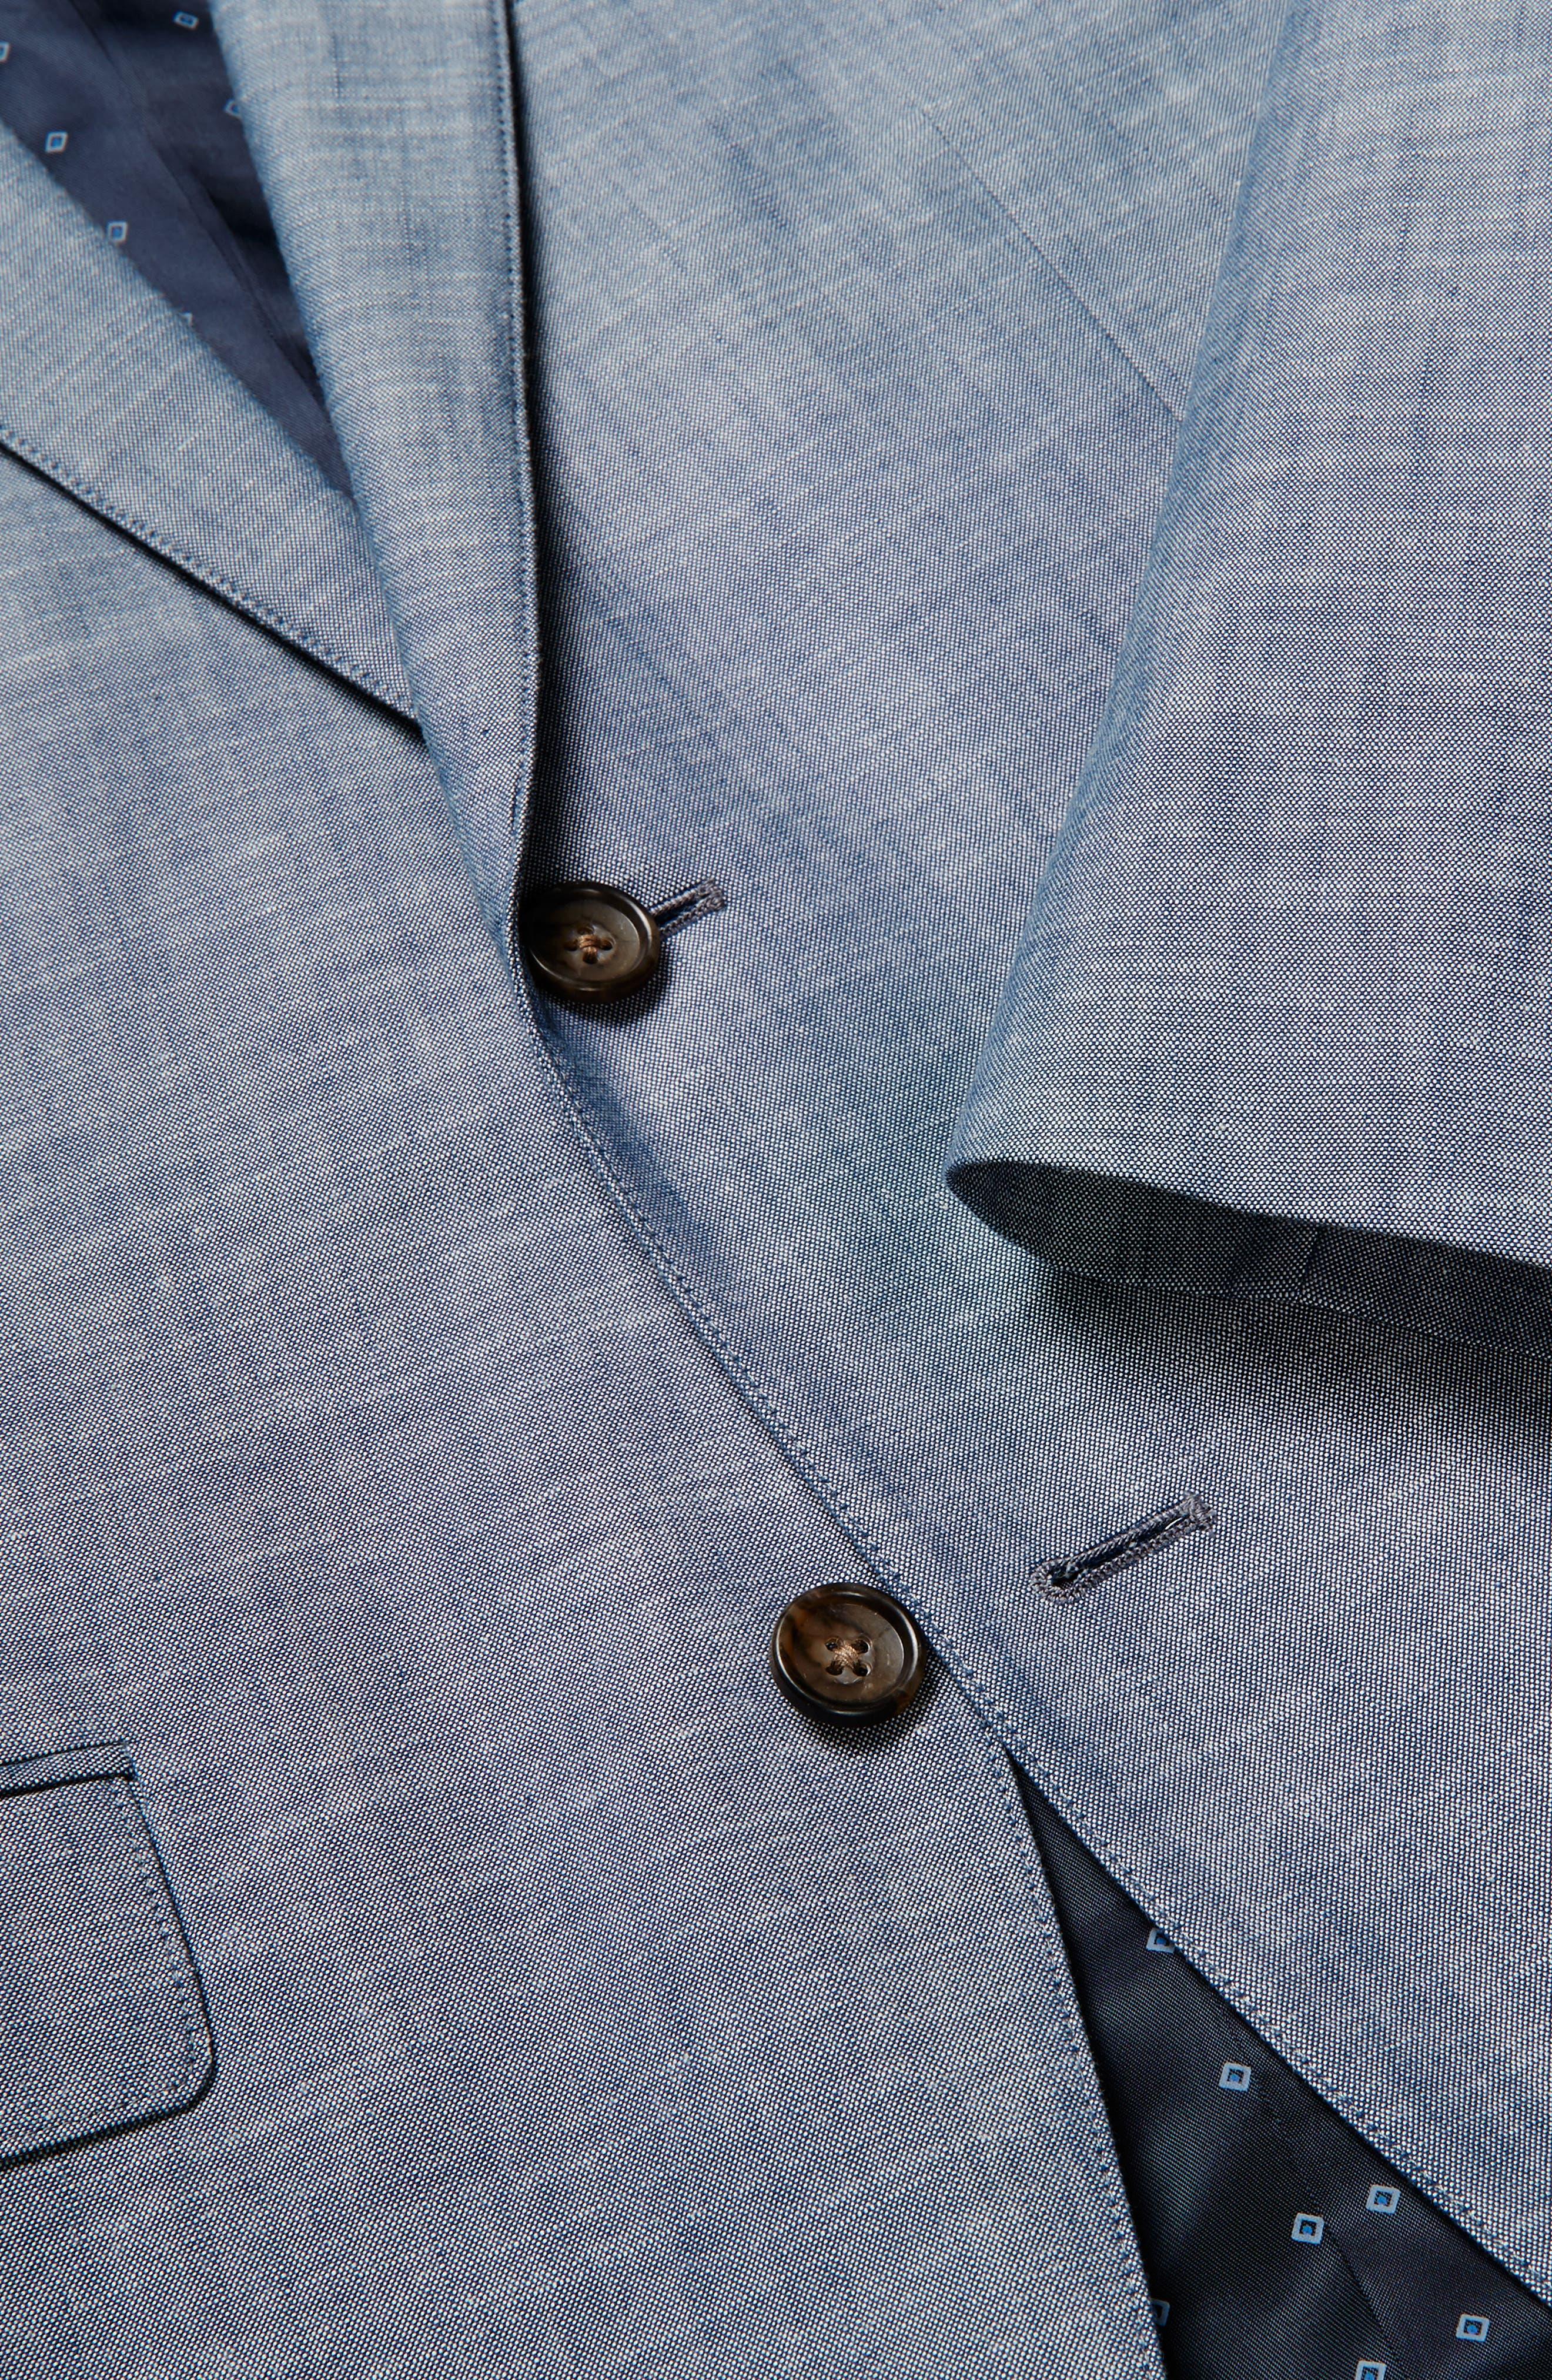 Trim Fit Chambray Cotton Blazer,                             Alternate thumbnail 3, color,                             SOLID BLUE